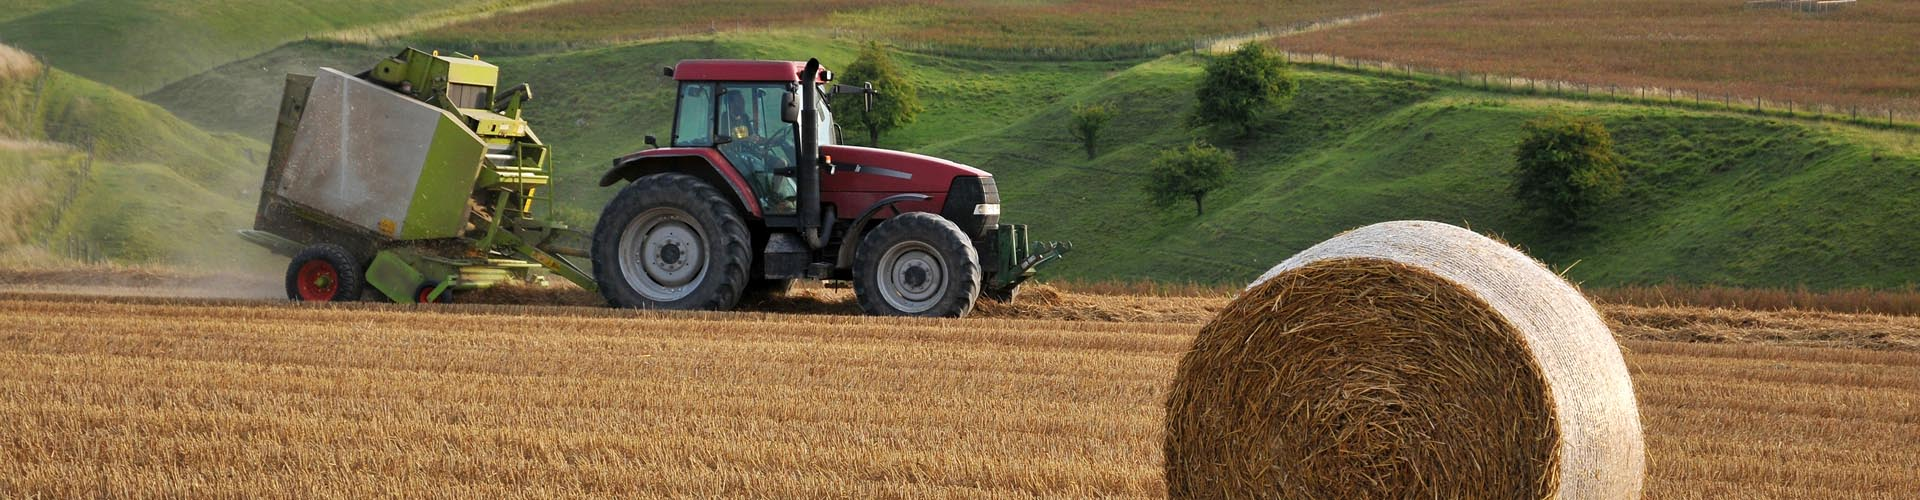 Agricultural pest control Doncaster